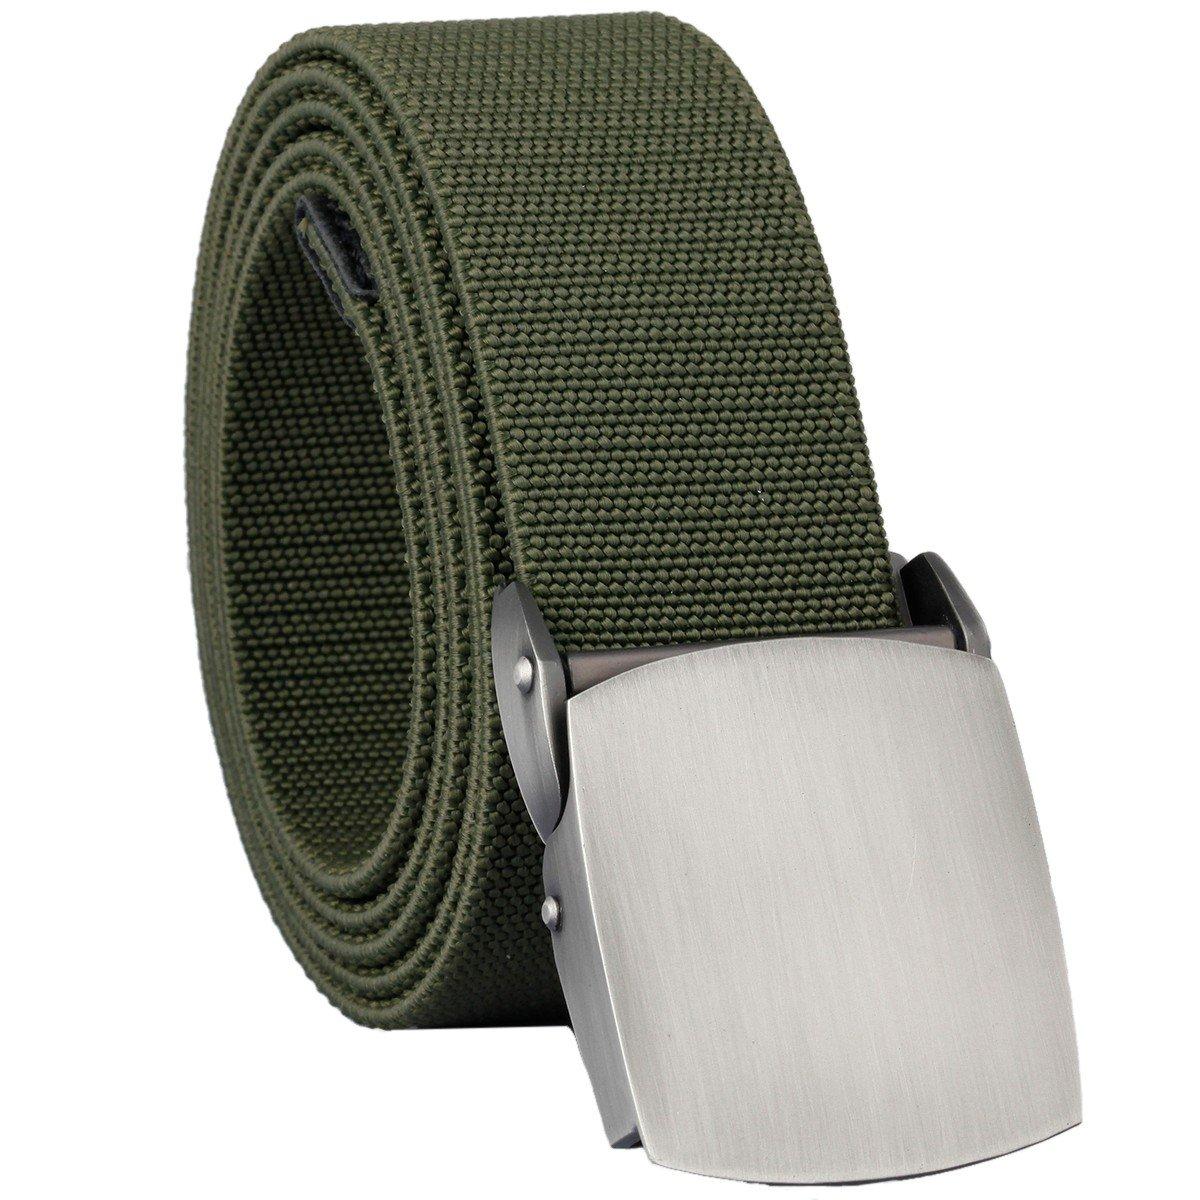 1xMens Outdoor Sports Military Tactical Nylon Waistband Canvas Web Belt Dazzling